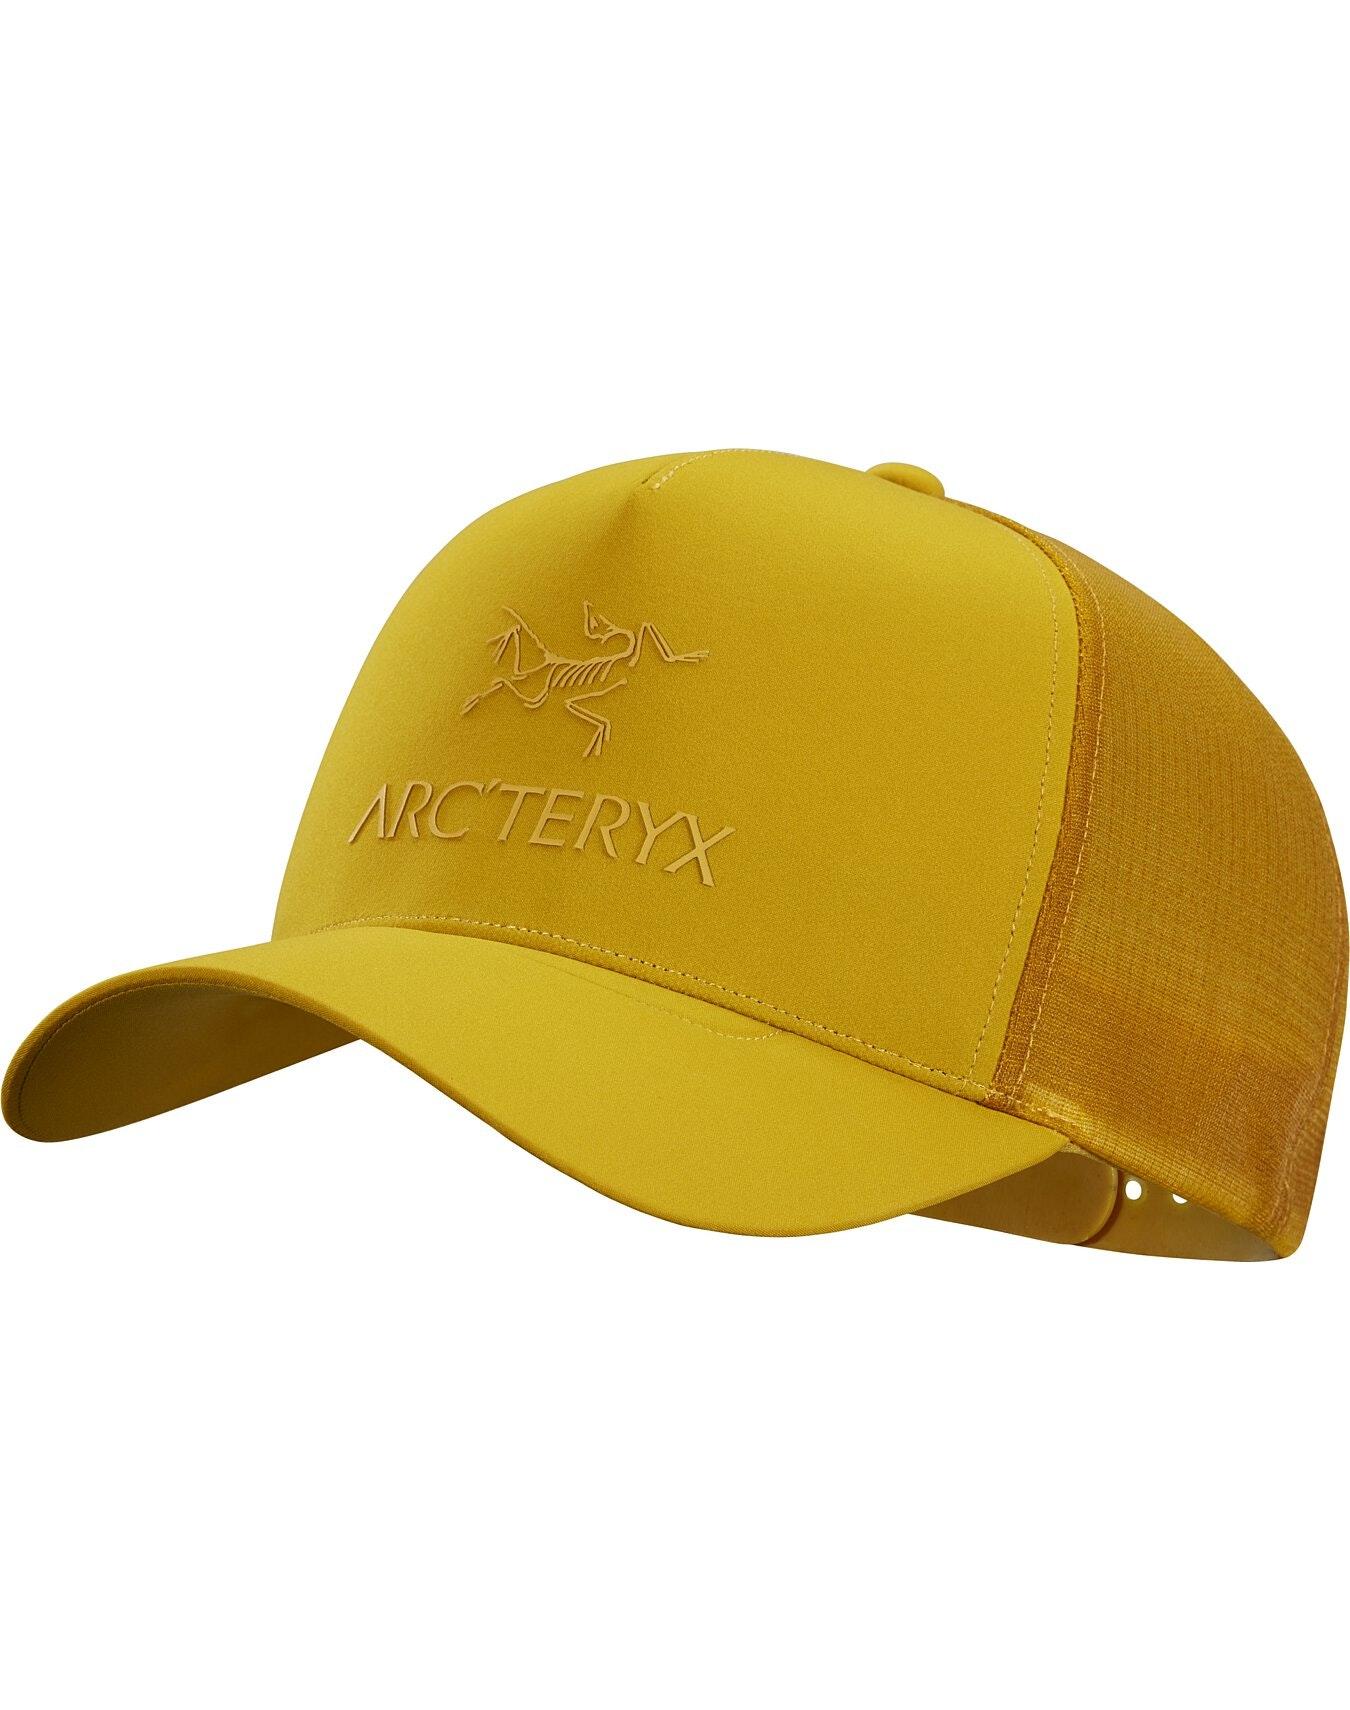 Logo Trucker Hat Pipe Dream